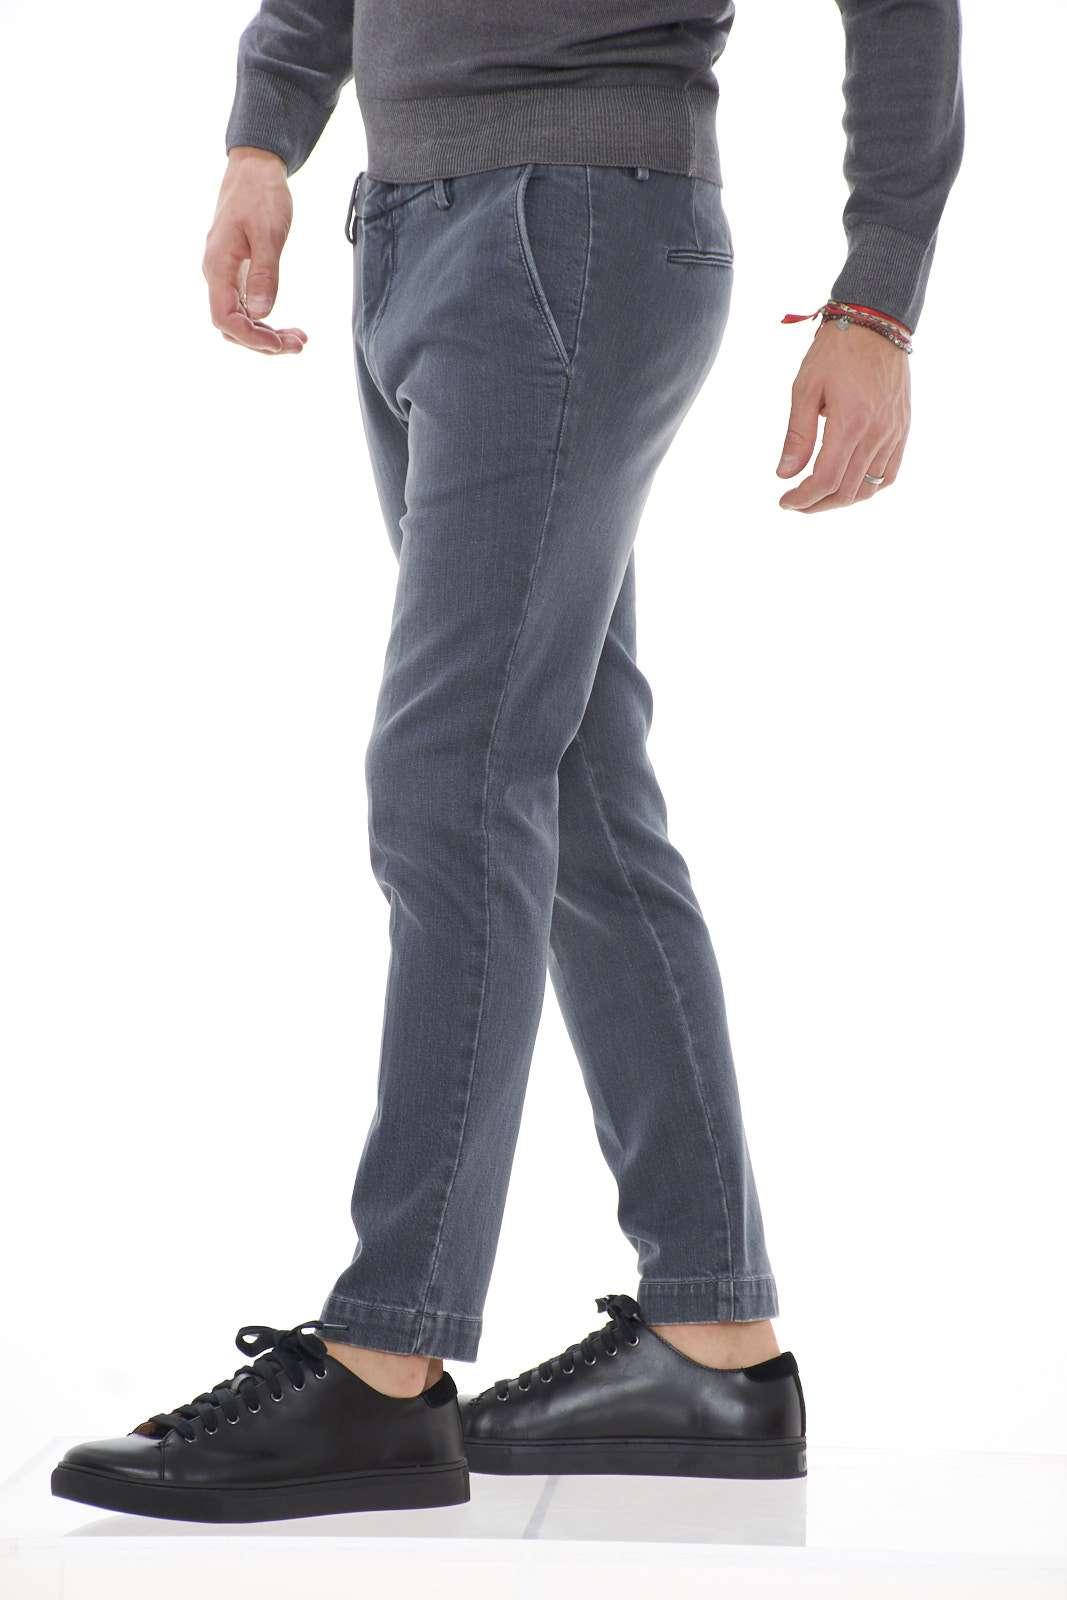 https://www.parmax.com/media/catalog/product/A/I/AI-outlet_parmax-pantalone-uomo-Michael-Coal-Brad1060-B.jpg